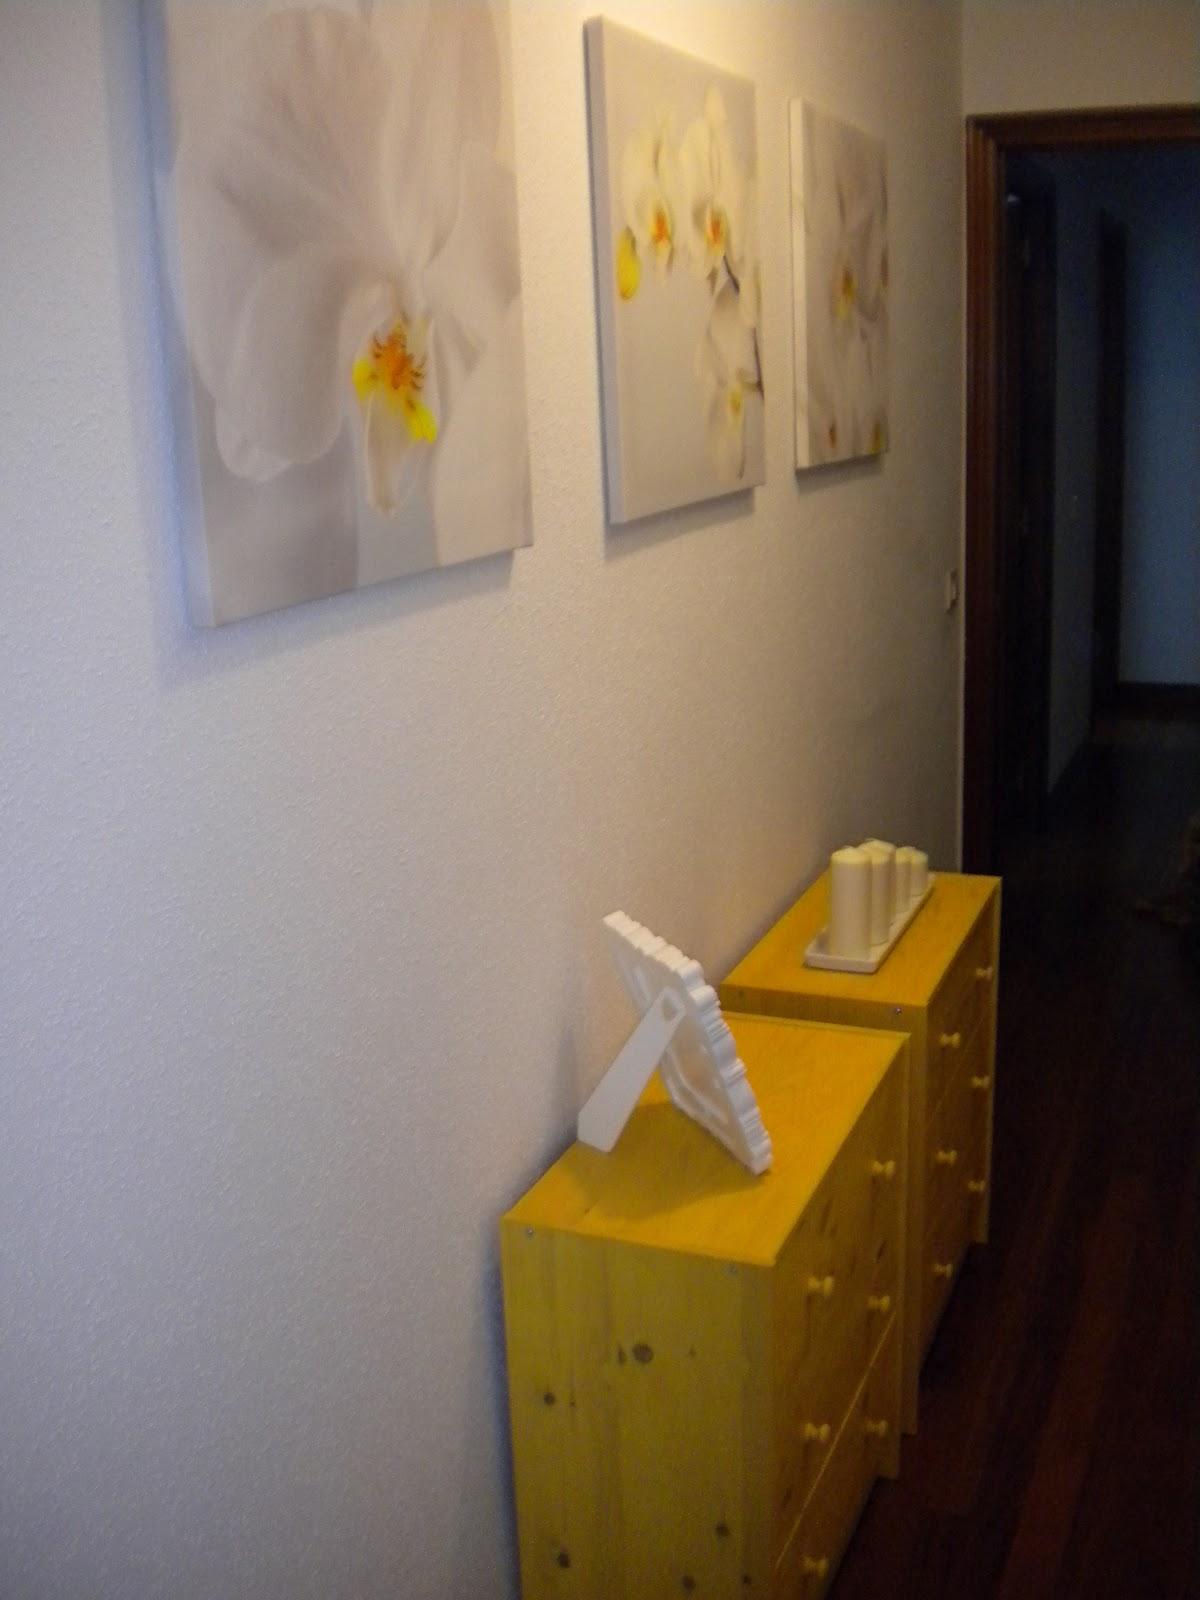 Momentos decorativos c moda de ikea - Tiradores decorativos ...